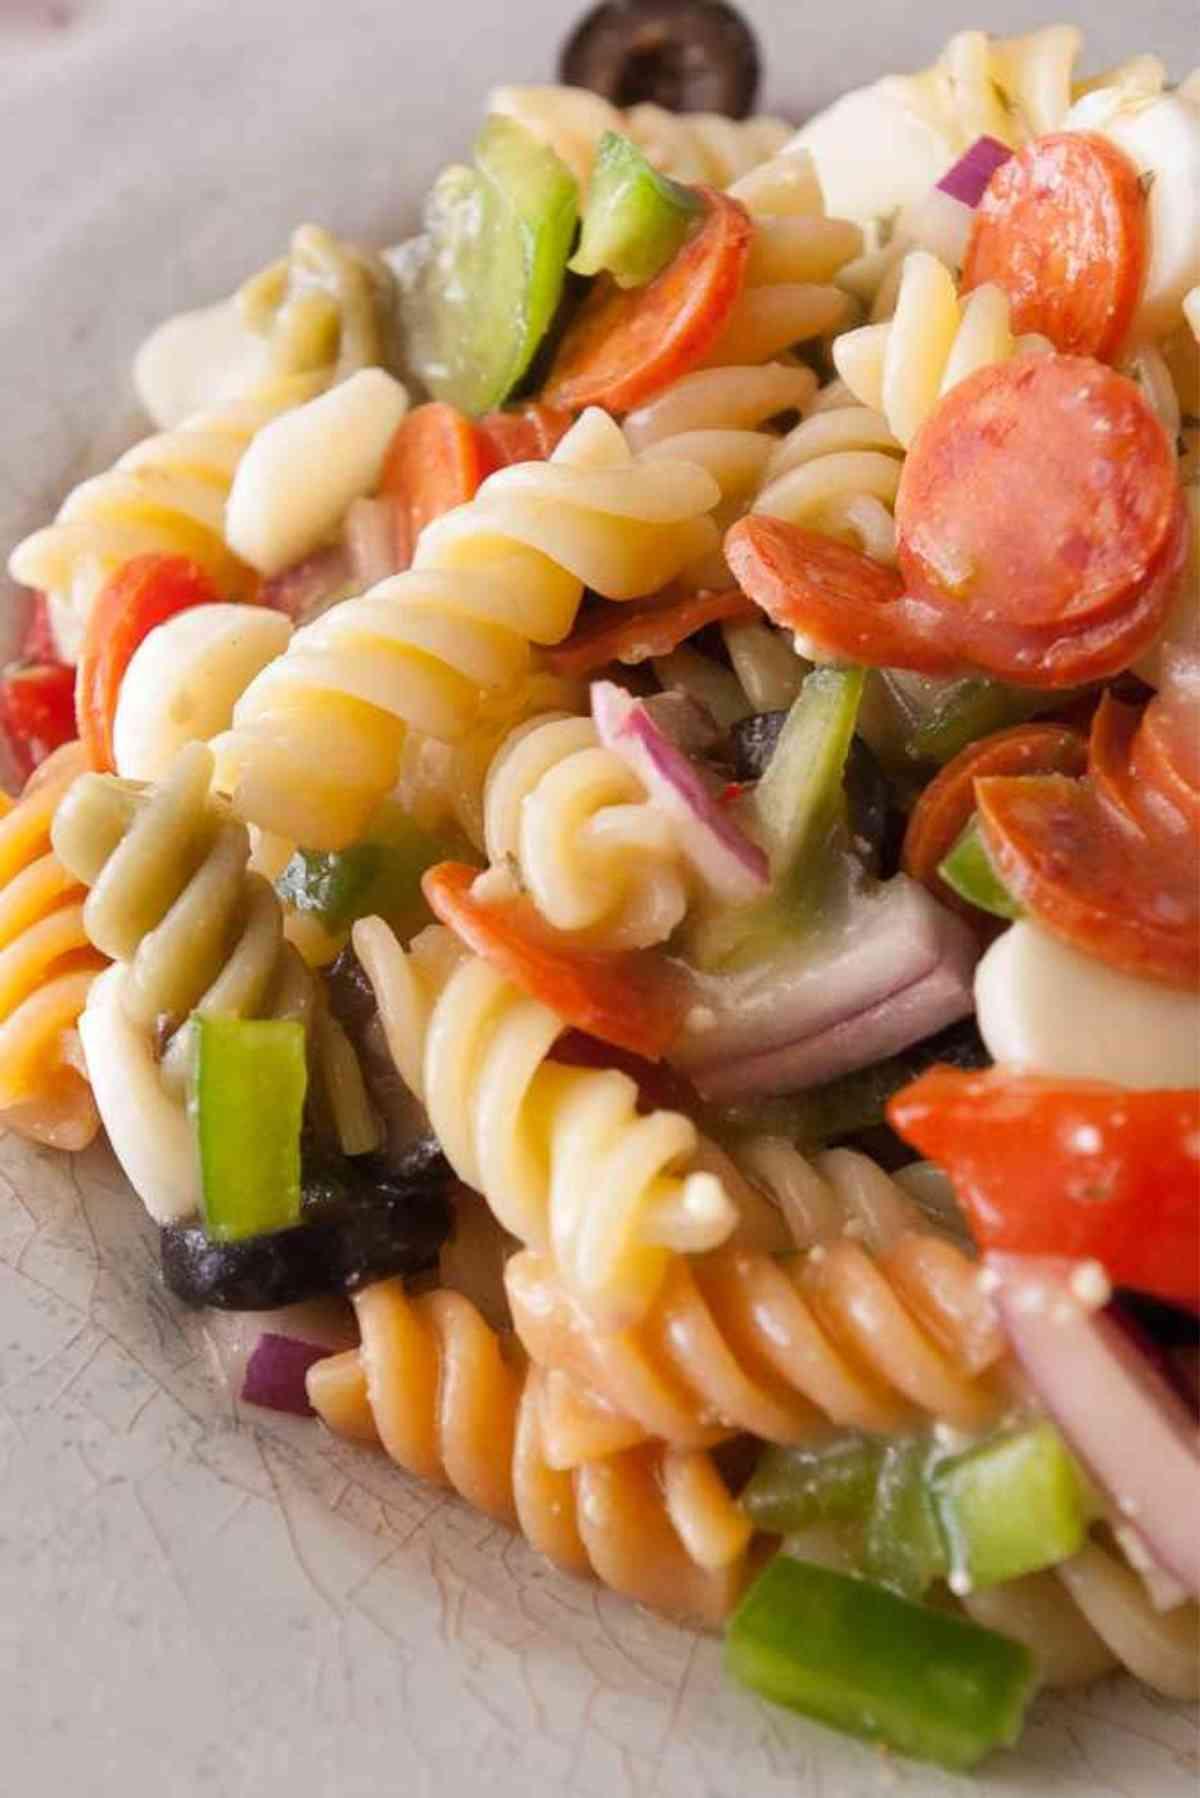 Plate of Italian Pasta Salad